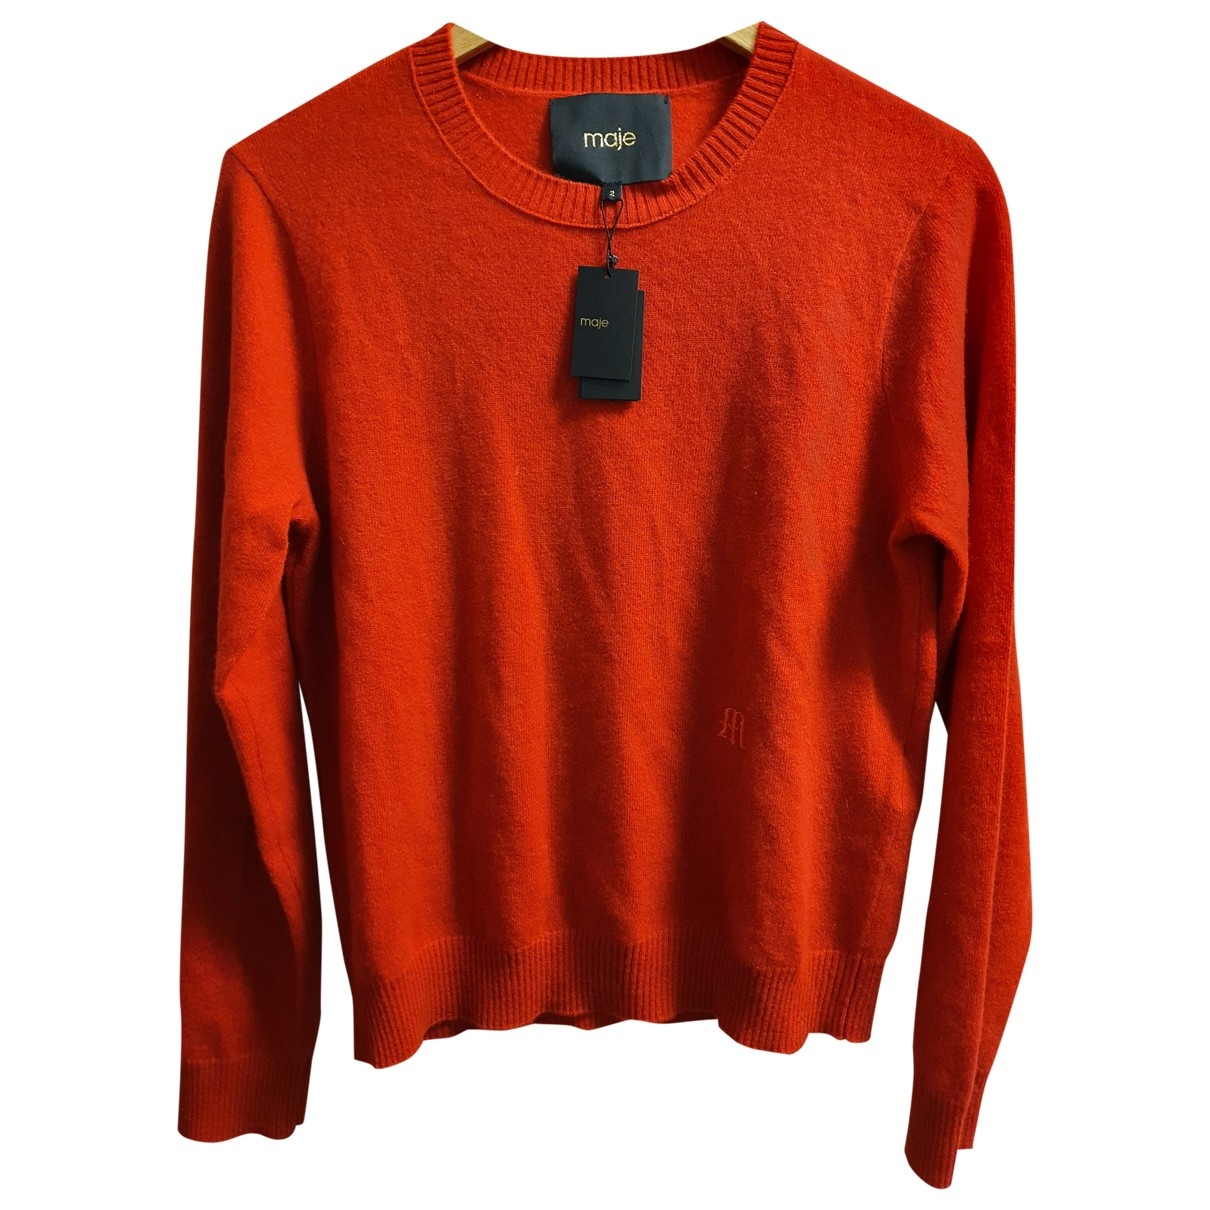 Maje Fall Winter 2019 Red Cashmere Knitwear for Women 2 0-5